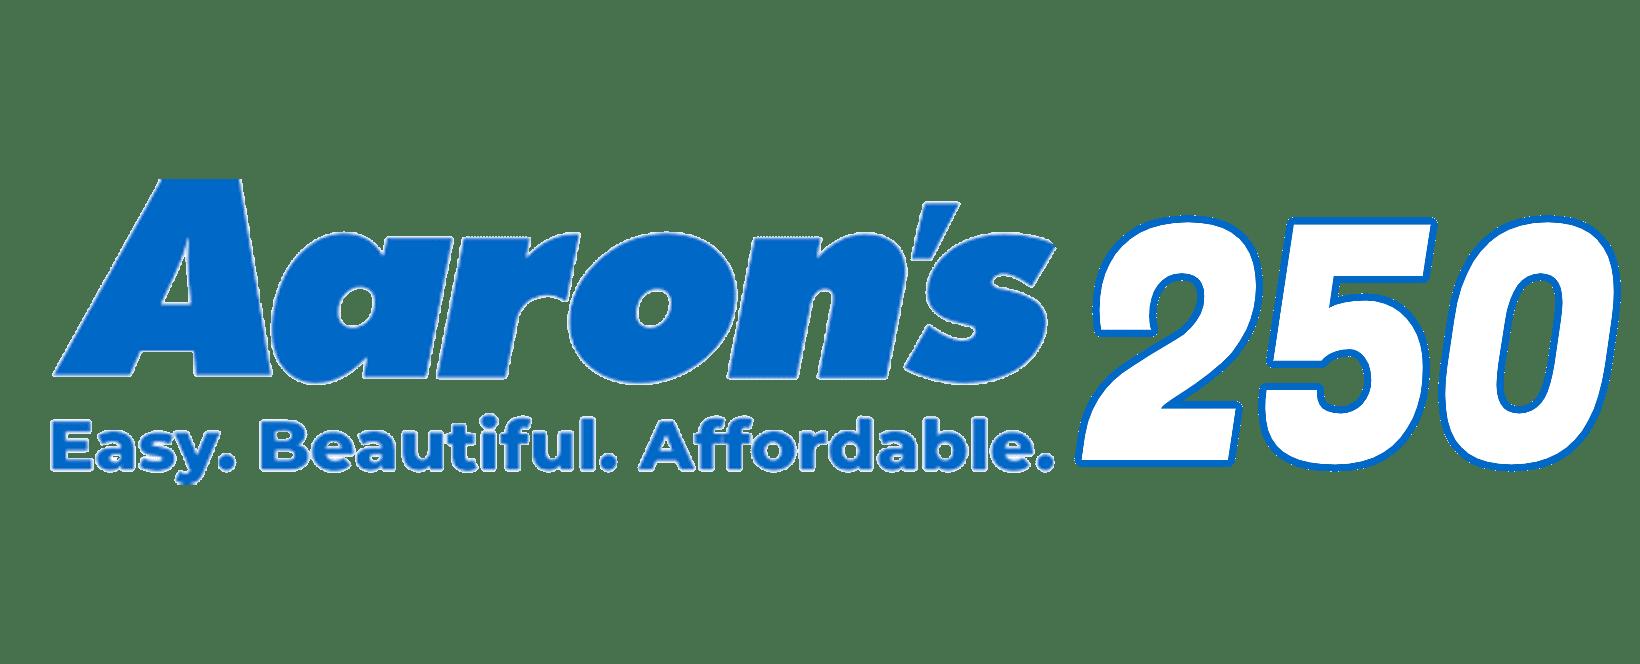 aarons250_florence_logo